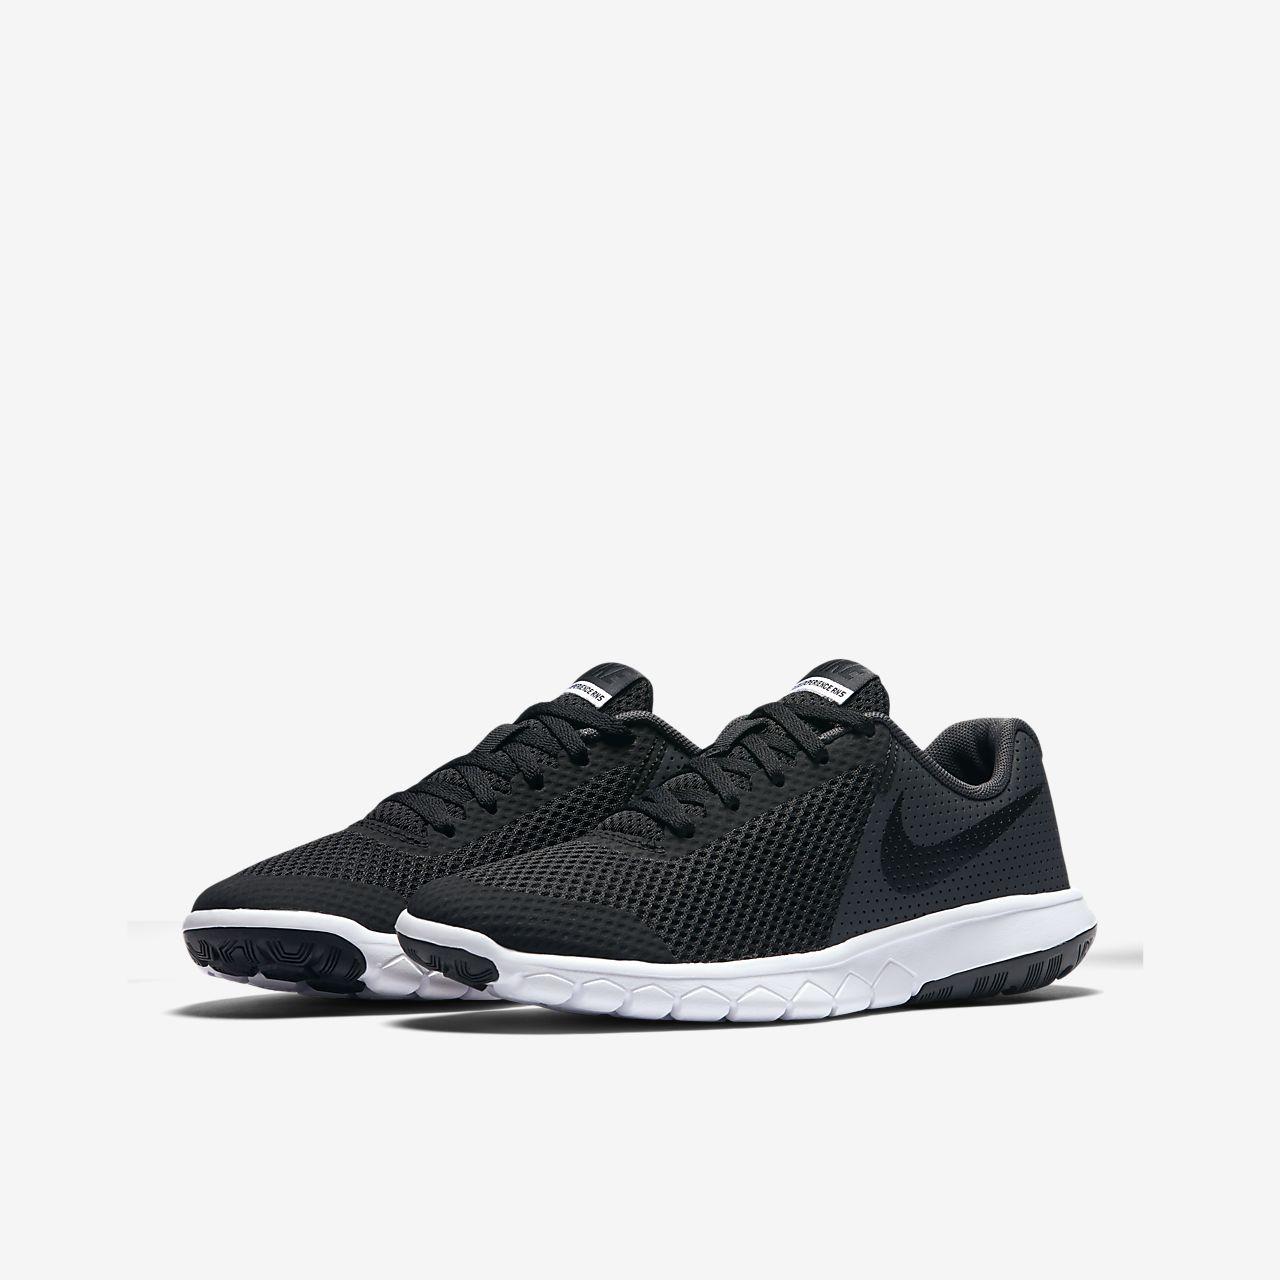 616b54cd571 Nike Flex Experience 5 Zapatillas de running - Niño a. Nike.com ES